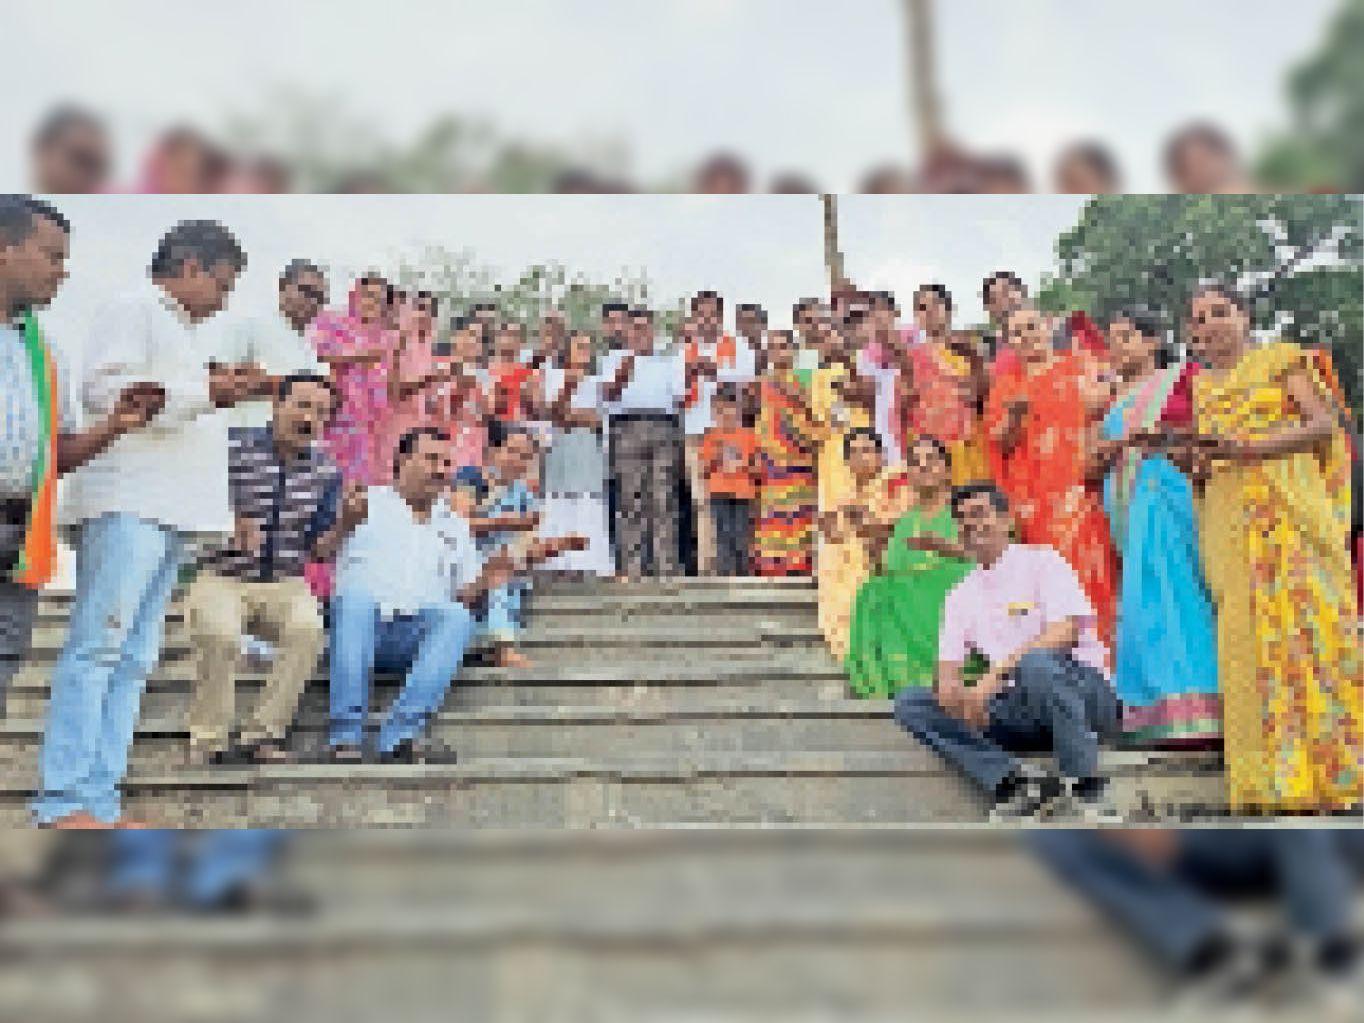 गेपसागर की पाल पर एकत्रित कार्यकर्ता व पदाधिकारी। - Dainik Bhaskar